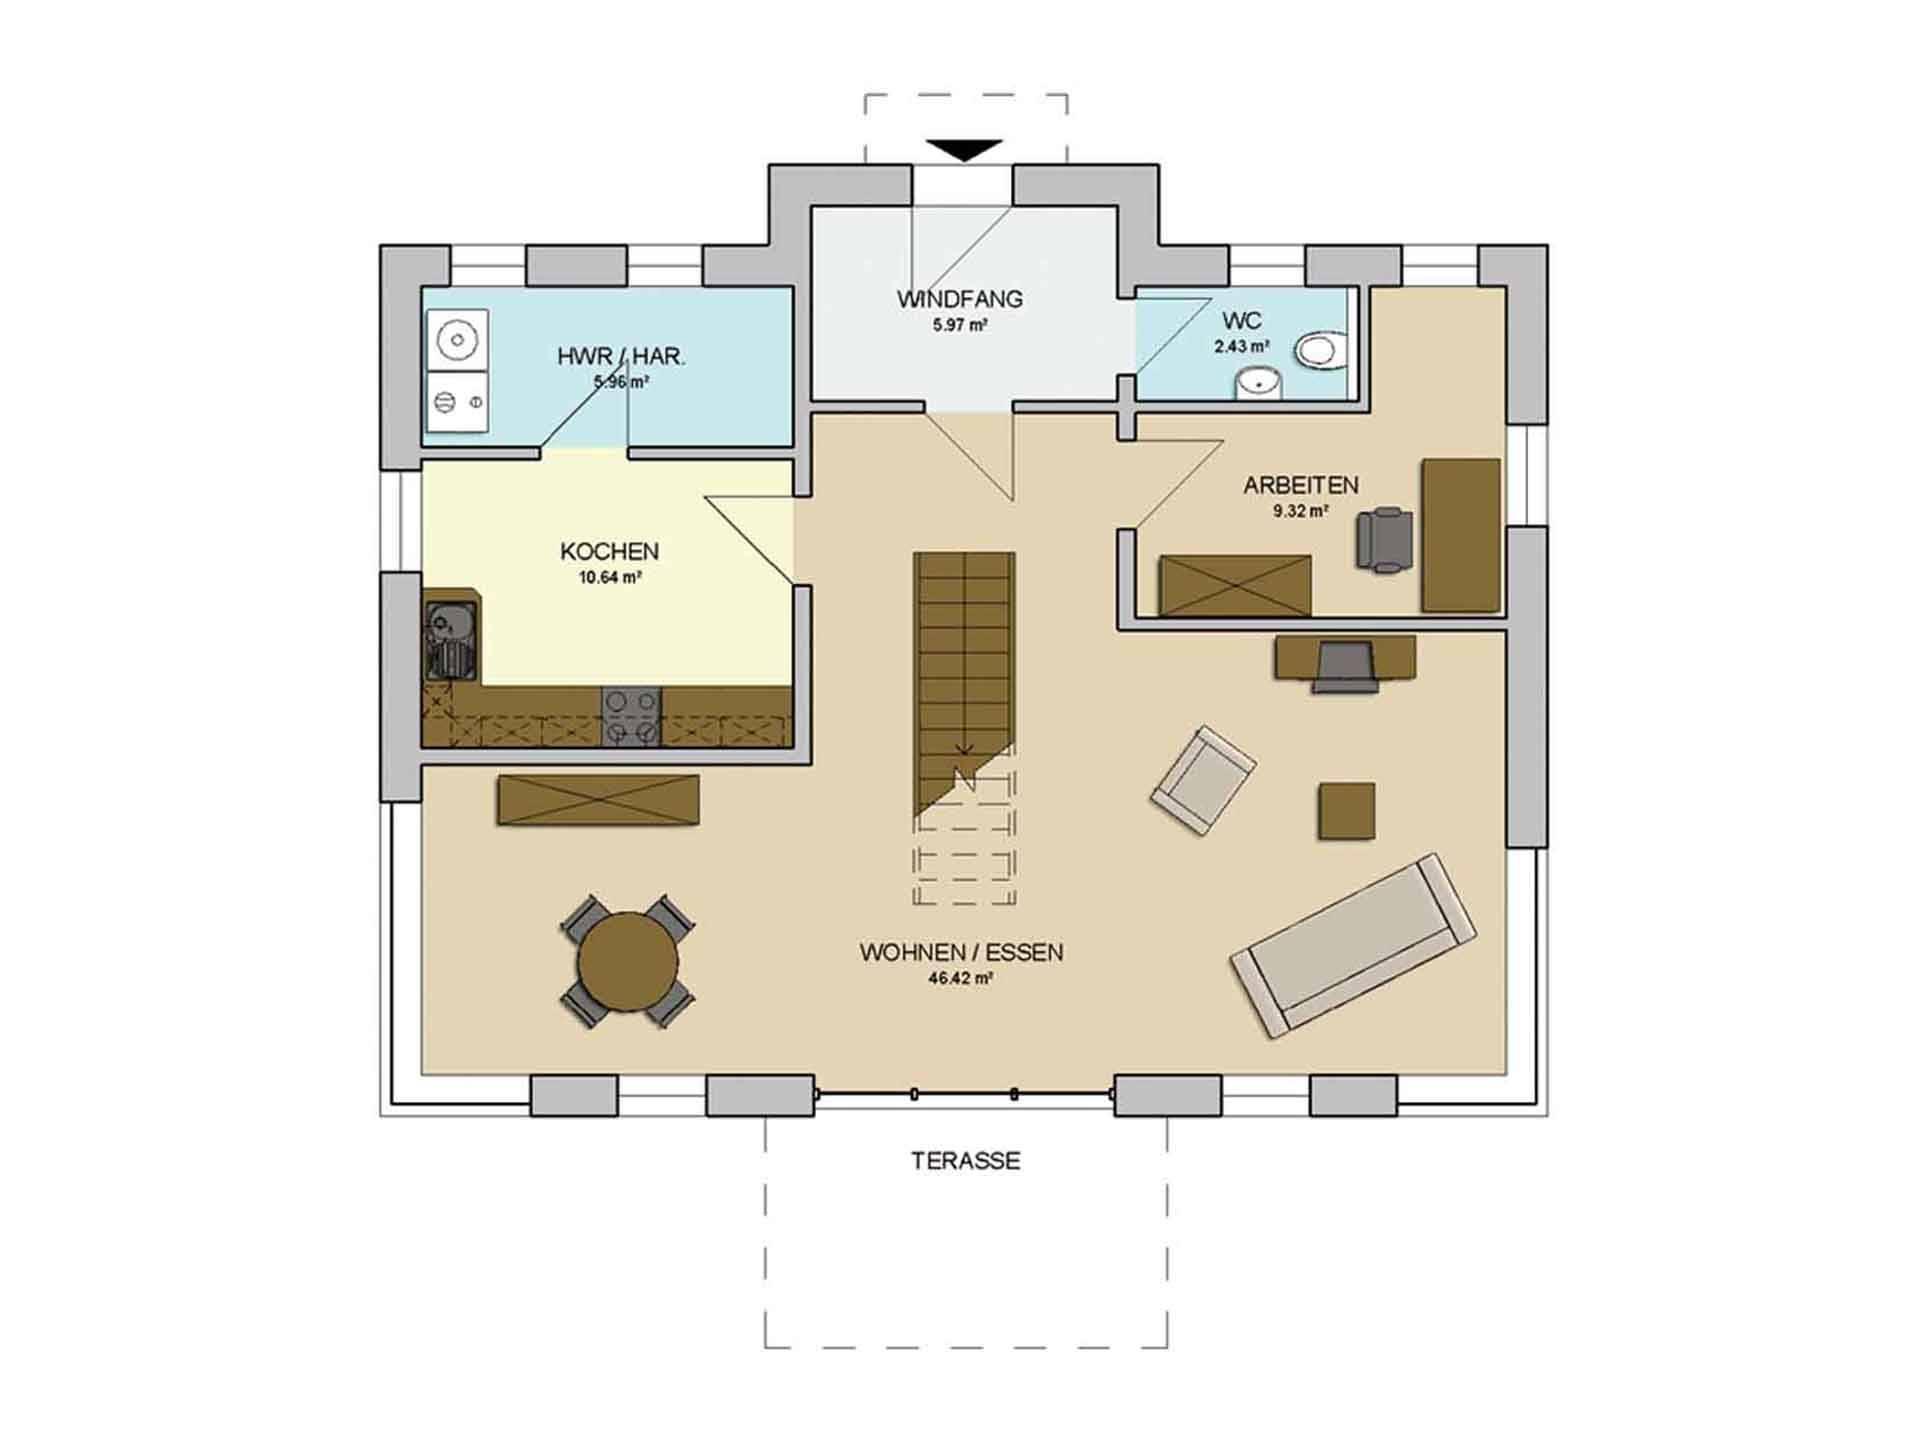 Grundriss Erdgeschoss Haus MODERN 146 von AP:art Haus GmbH